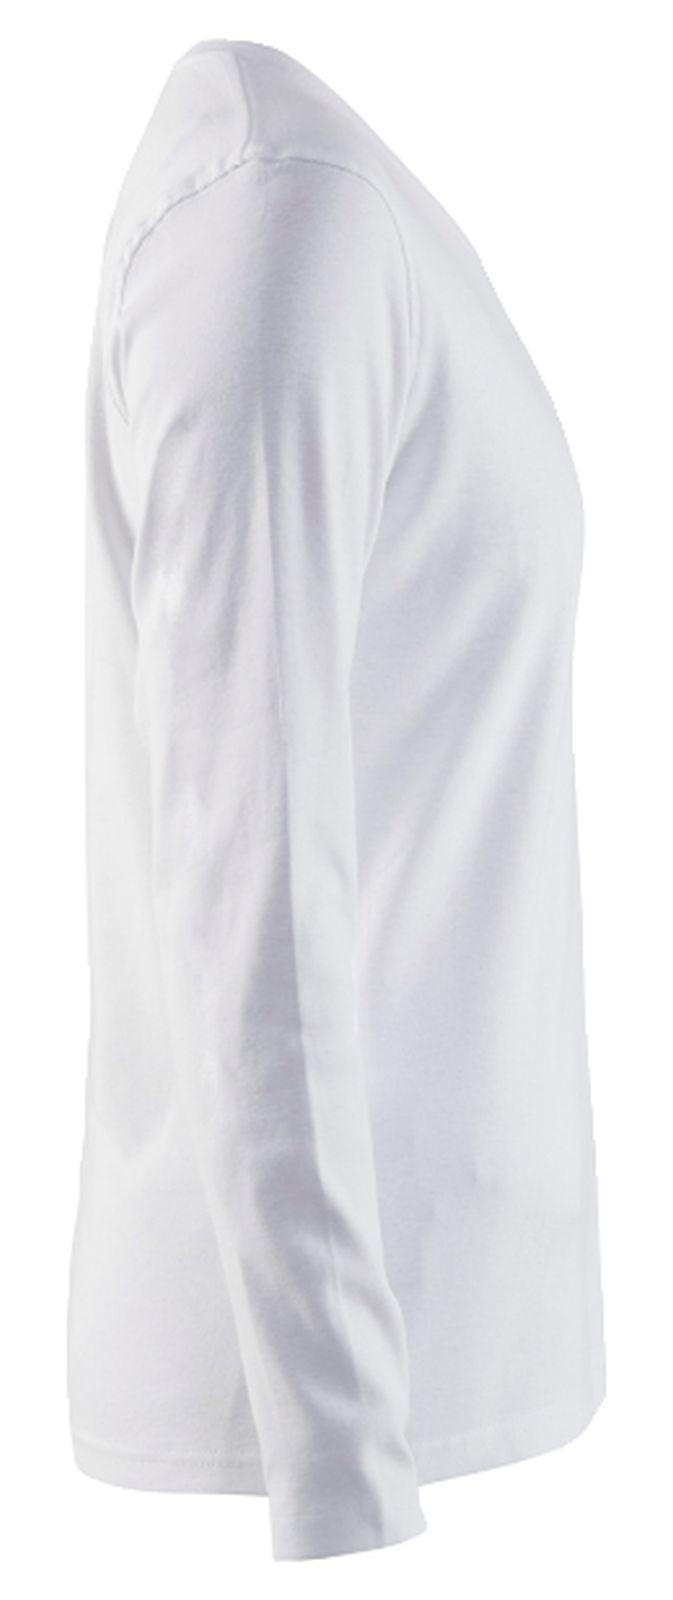 Blaklader T-shirts 33011032 wit(1000)